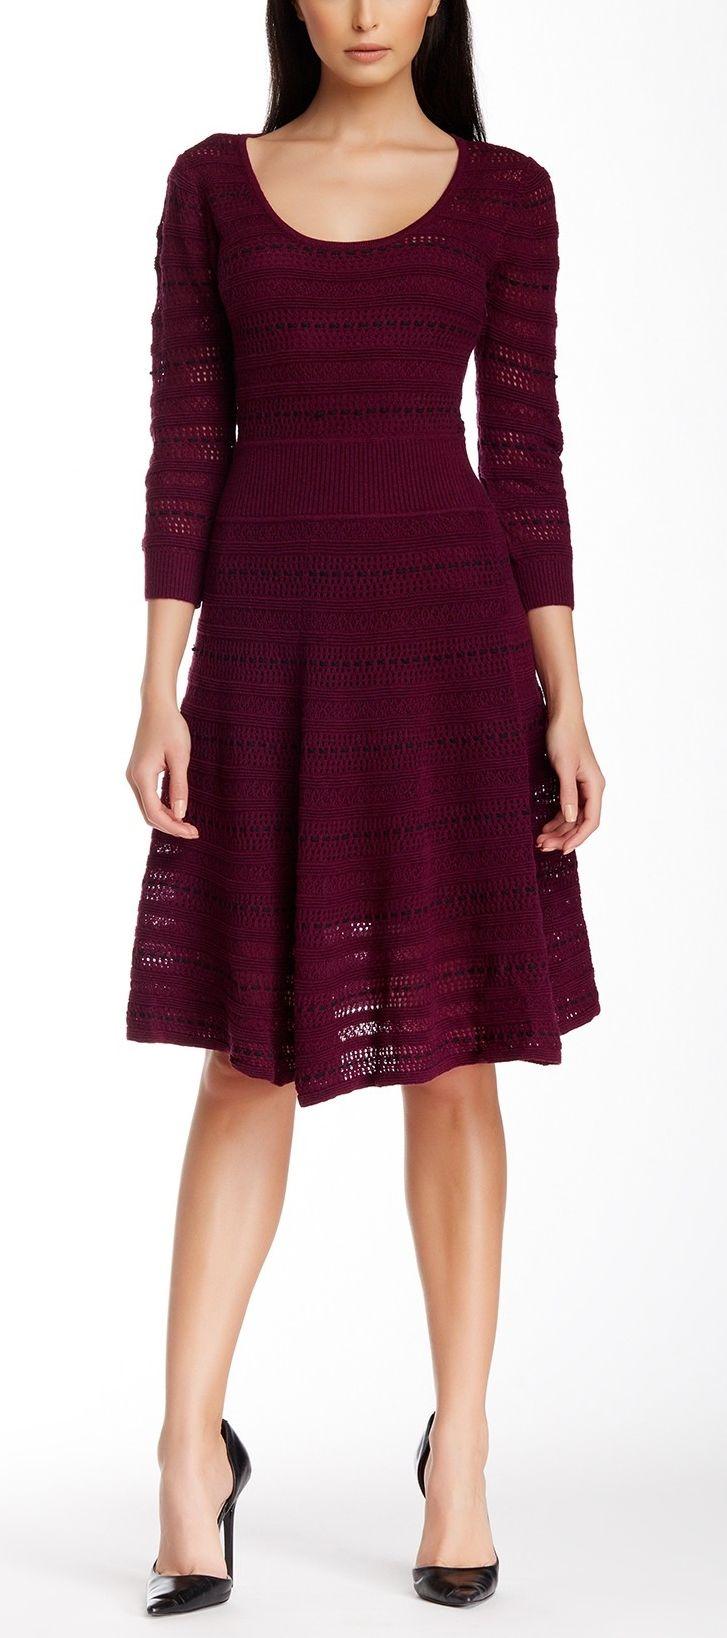 d57737f276cd2 Catherine Malandrino Wool Blend Sweater Dress